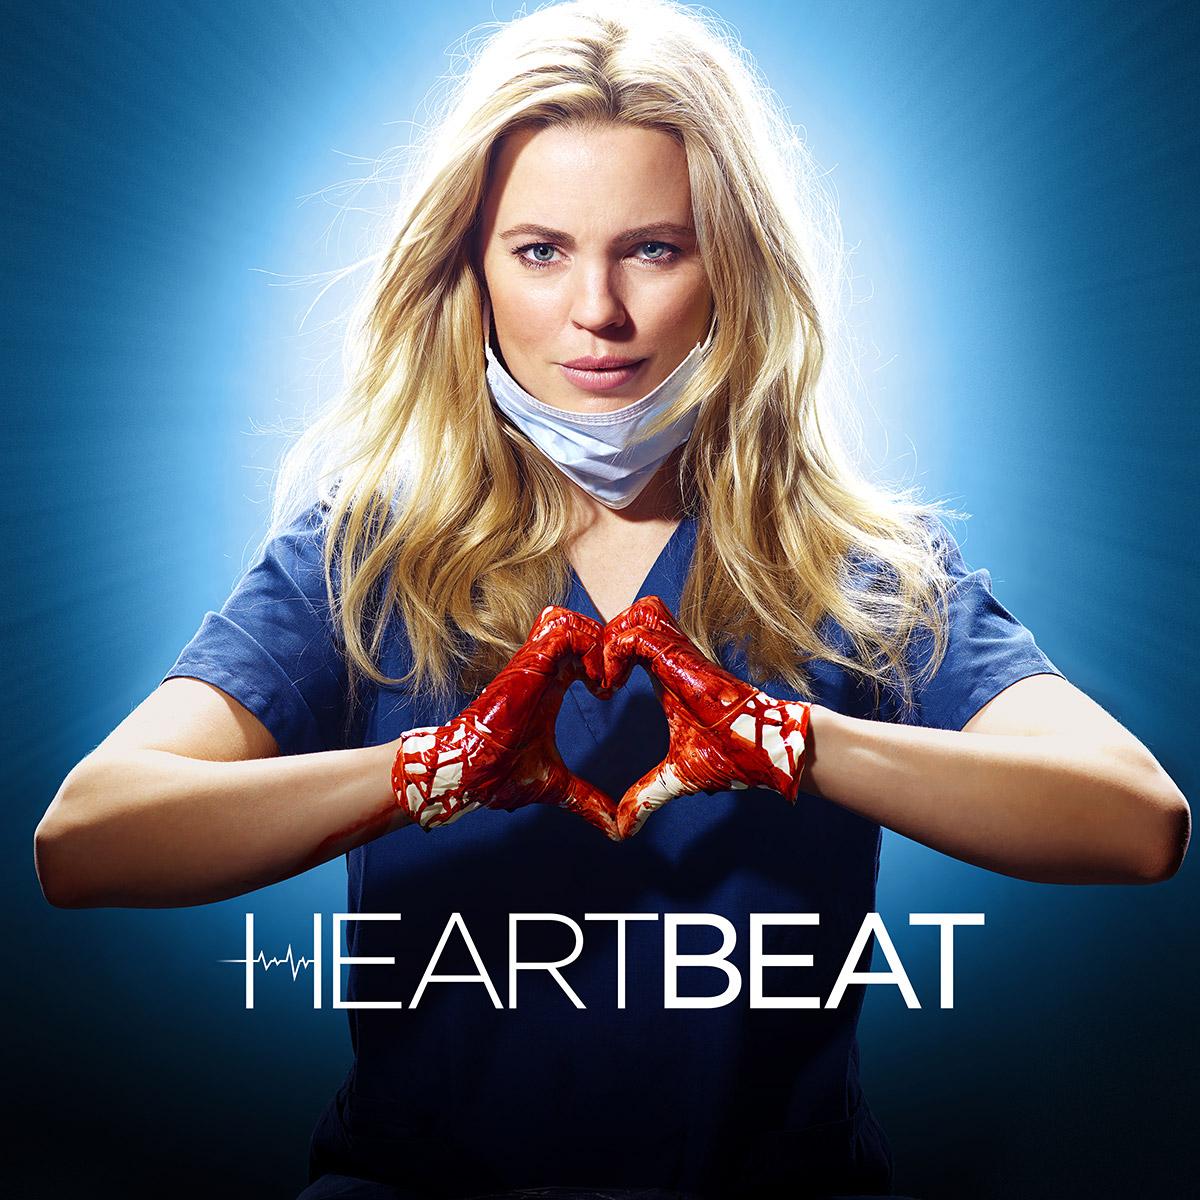 Heartbeat-NBC-TV-series-artwork.jpg